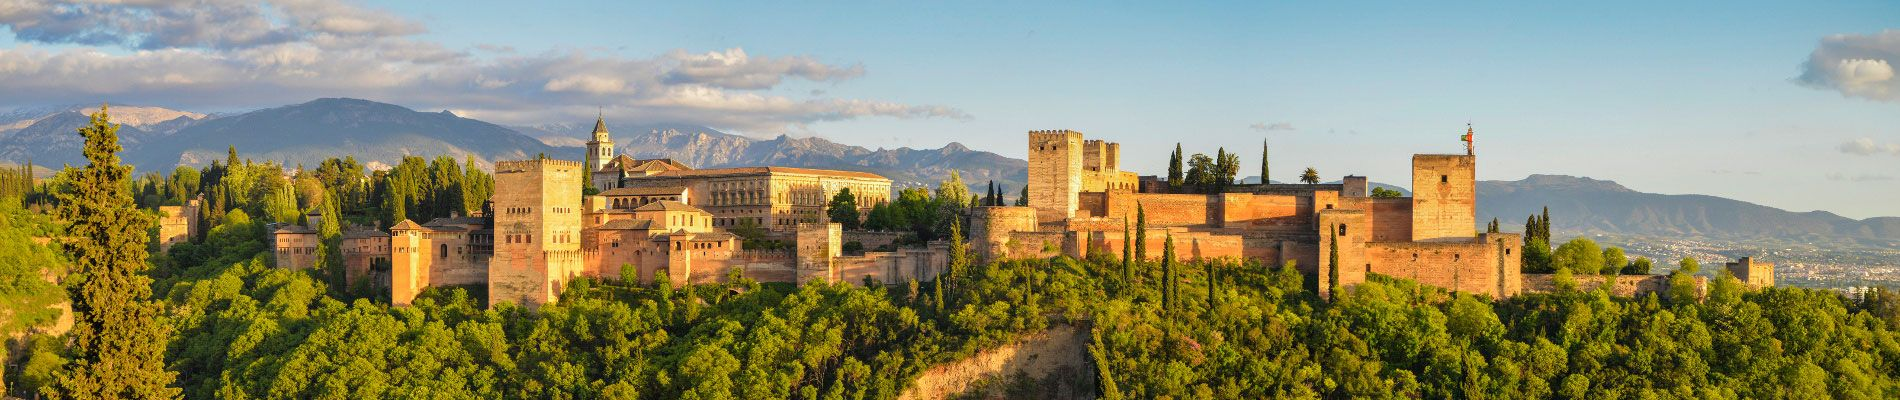 espagne-granada-alhambra-palais-st